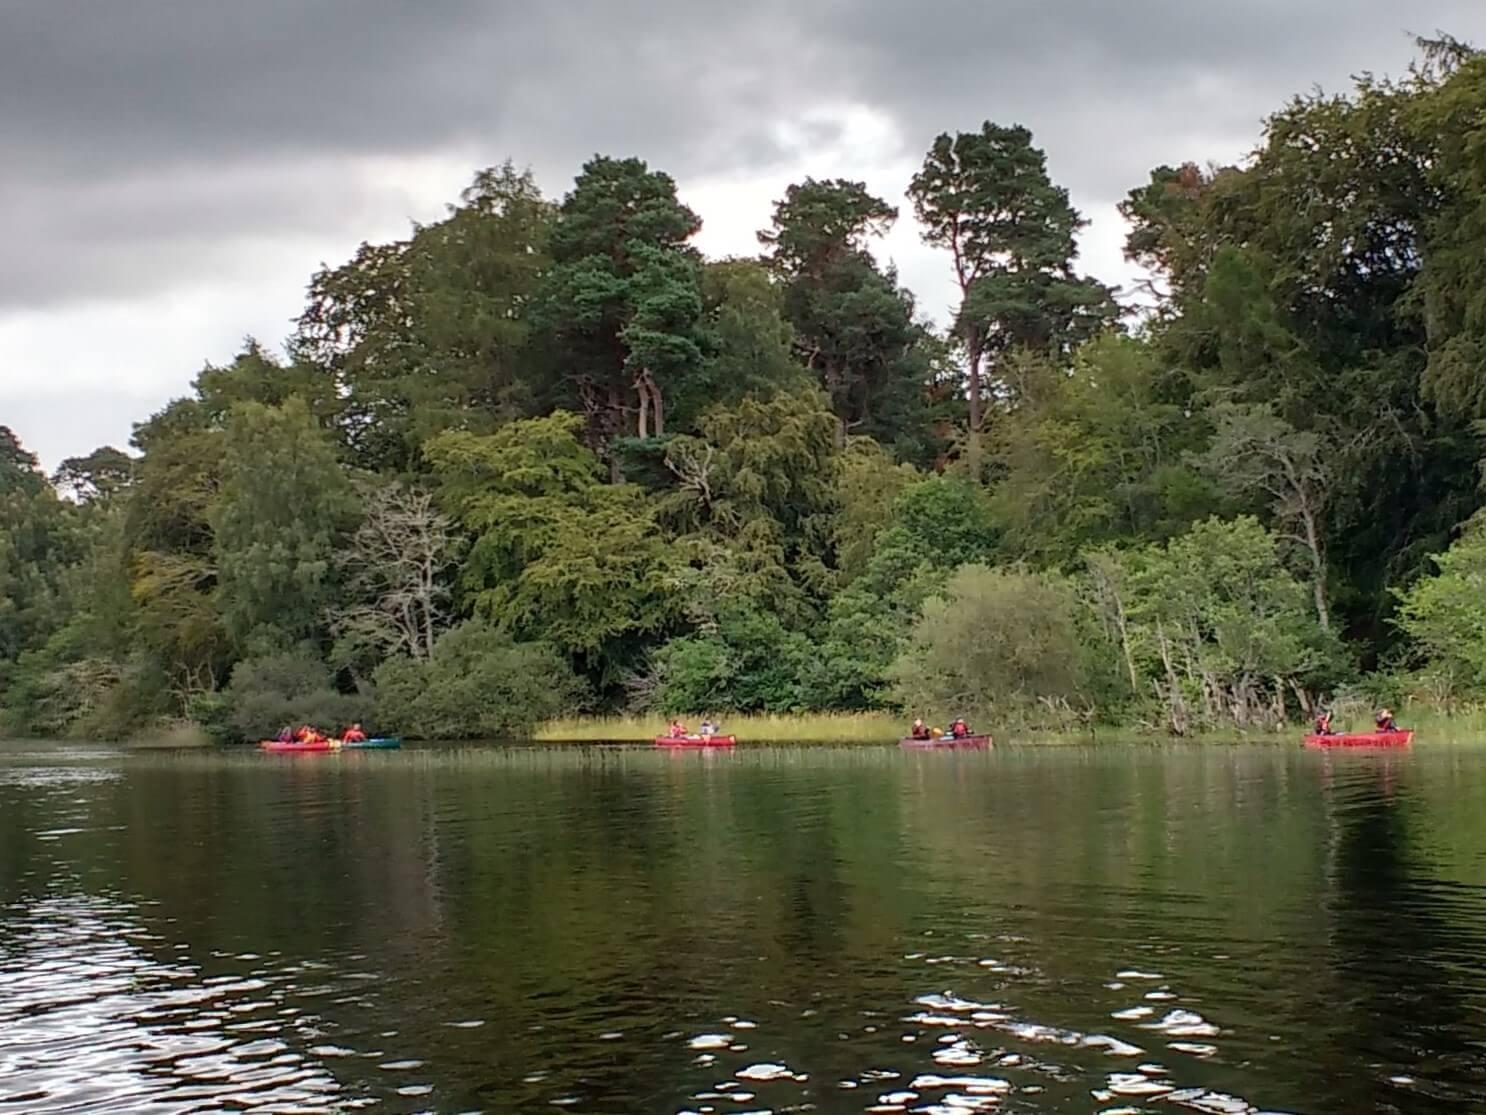 Loch-Insh-Water-Sports